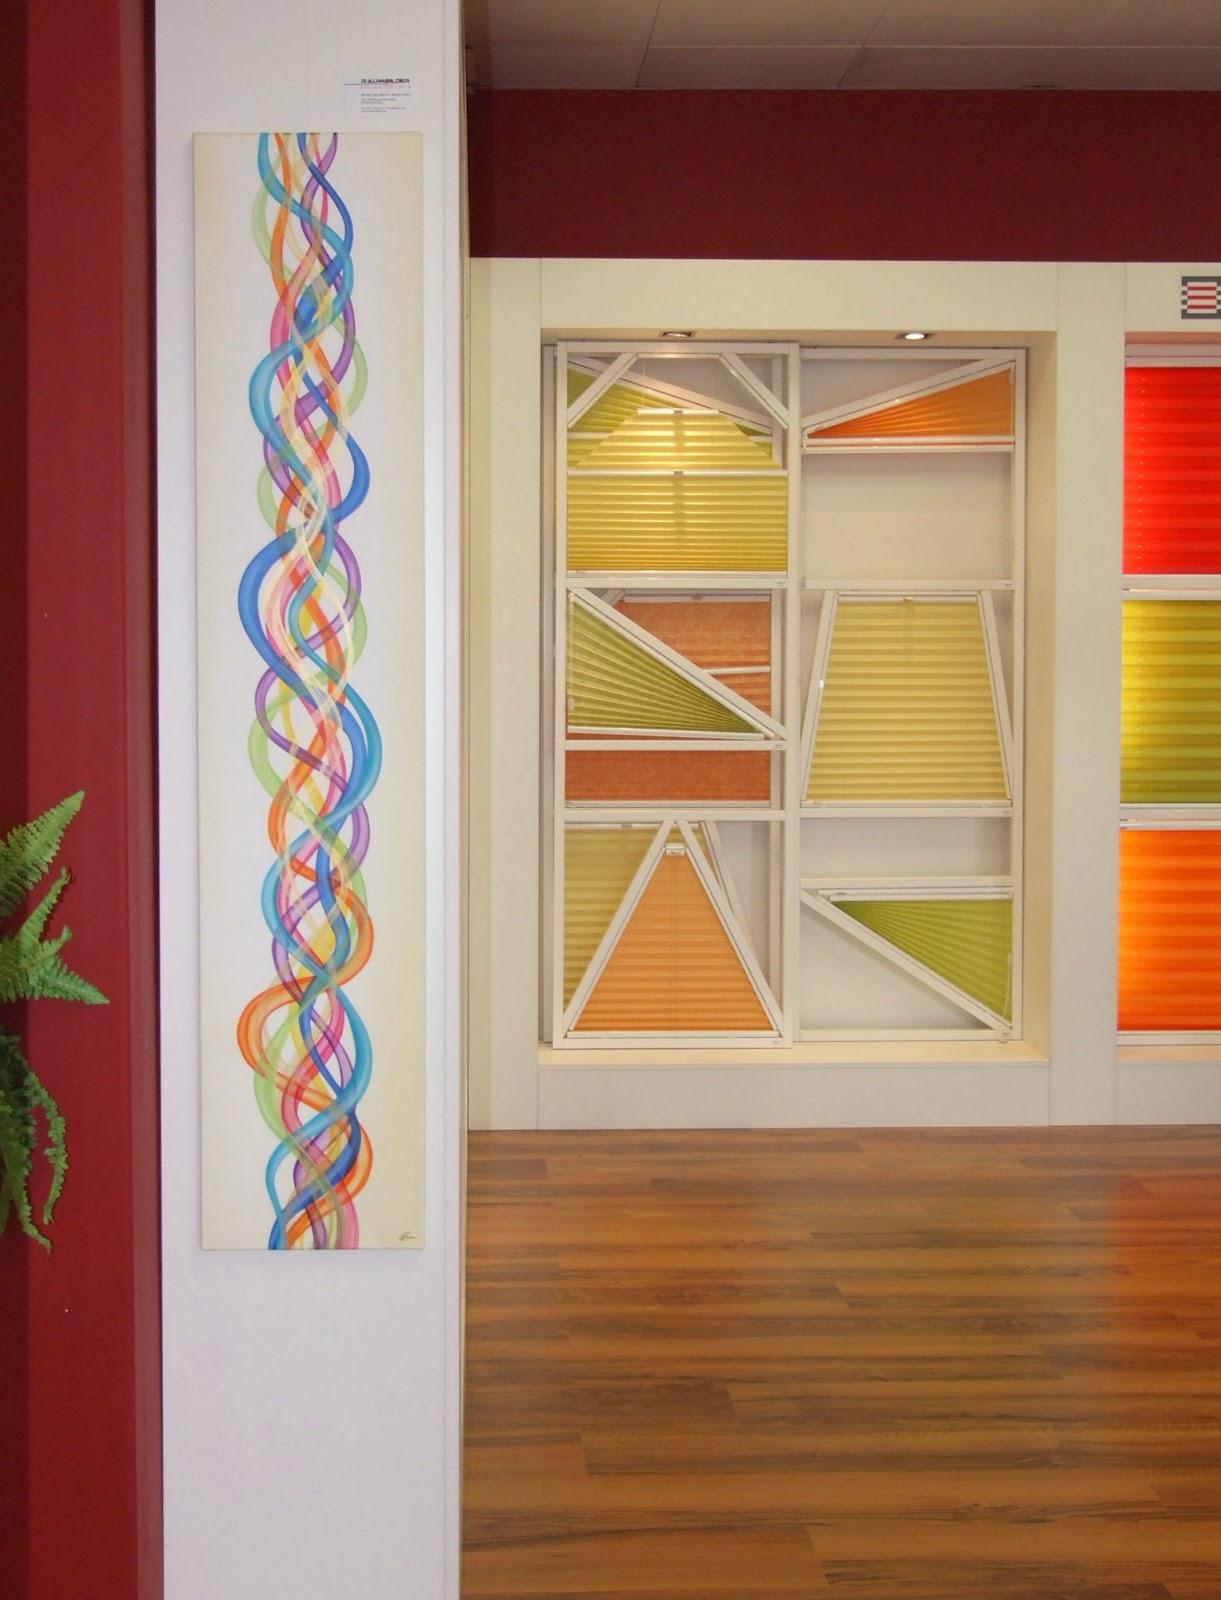 netzwerke feng shui malerei auf der para vital messe. Black Bedroom Furniture Sets. Home Design Ideas